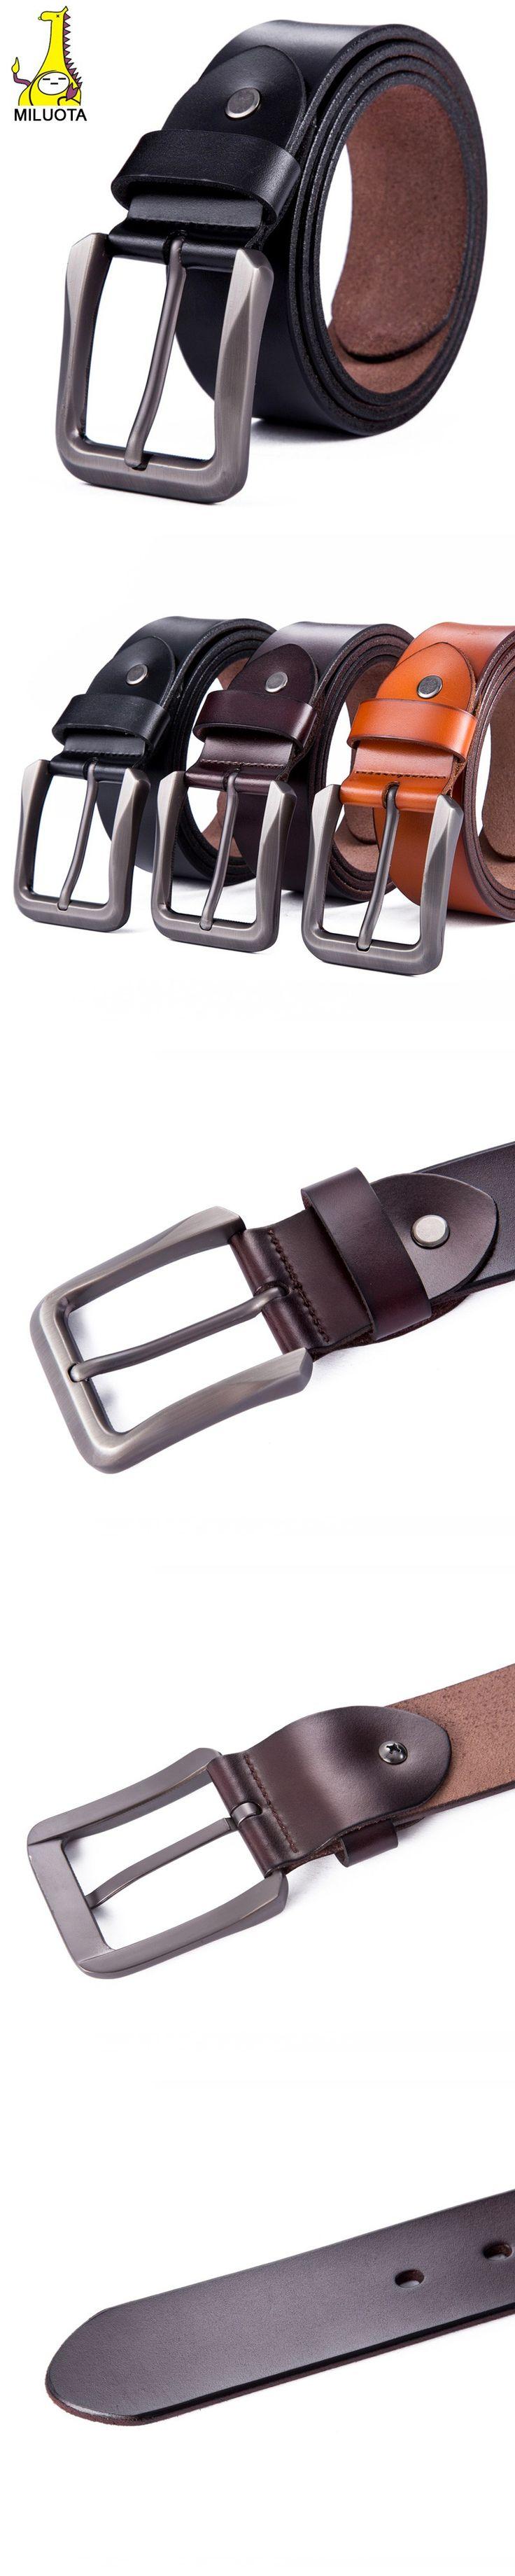 [MILUOTA] 2015 Fashion mens belts luxury genuine leather belt men cinto designer belt buckle hiqh quality ceintures homme WND002 $21.13